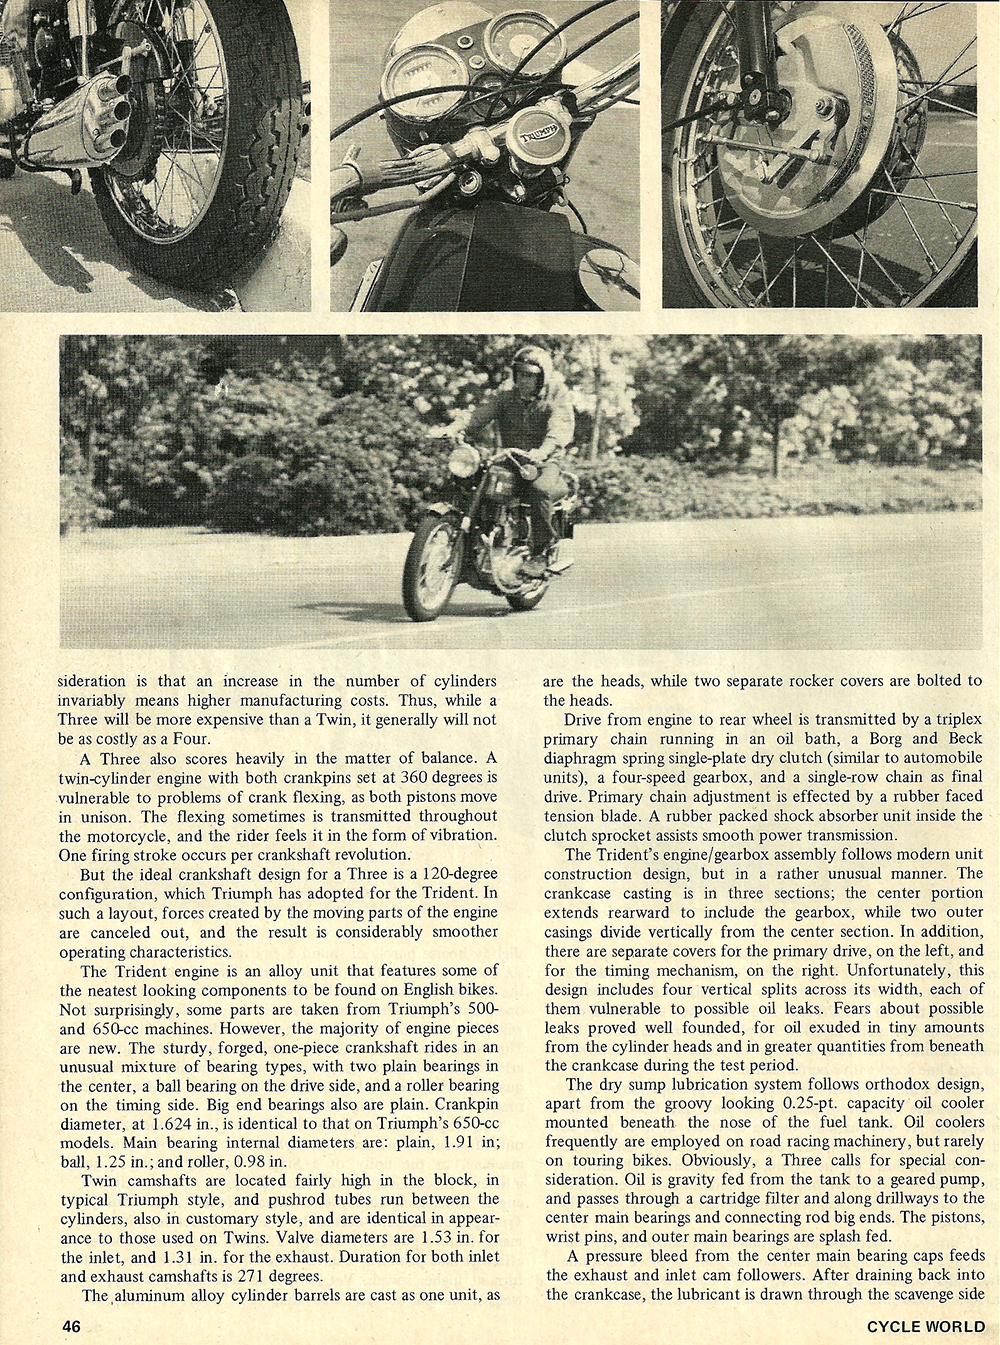 1968 Triumph Trident 750 road test 03.jpg